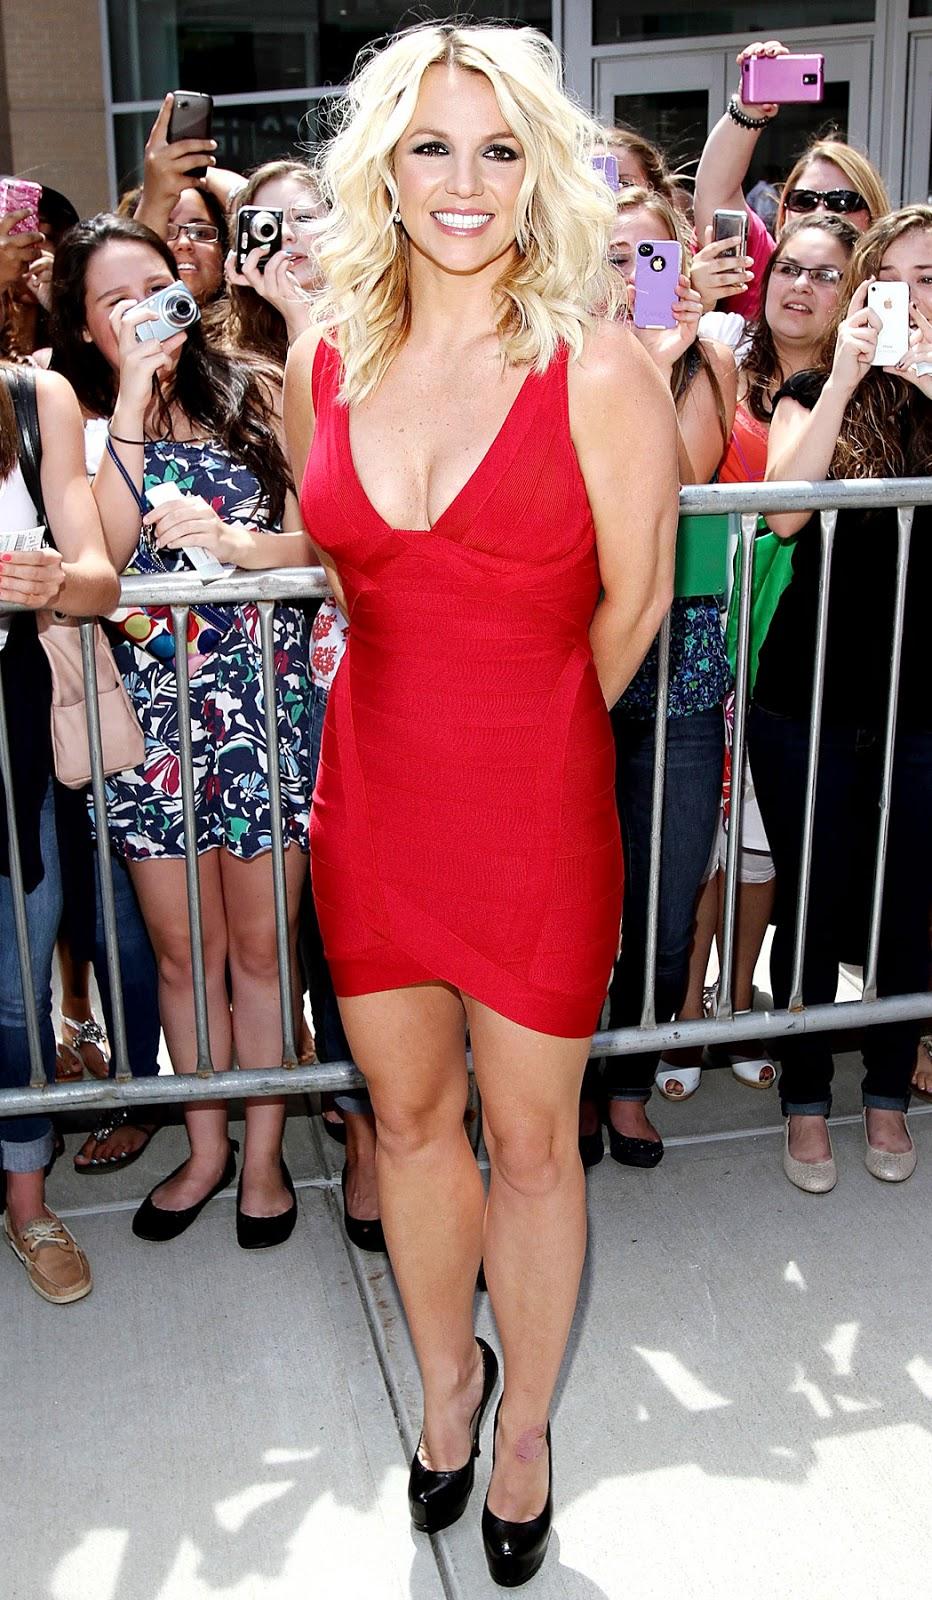 Britney Spears: Hot Britney Spears Dress